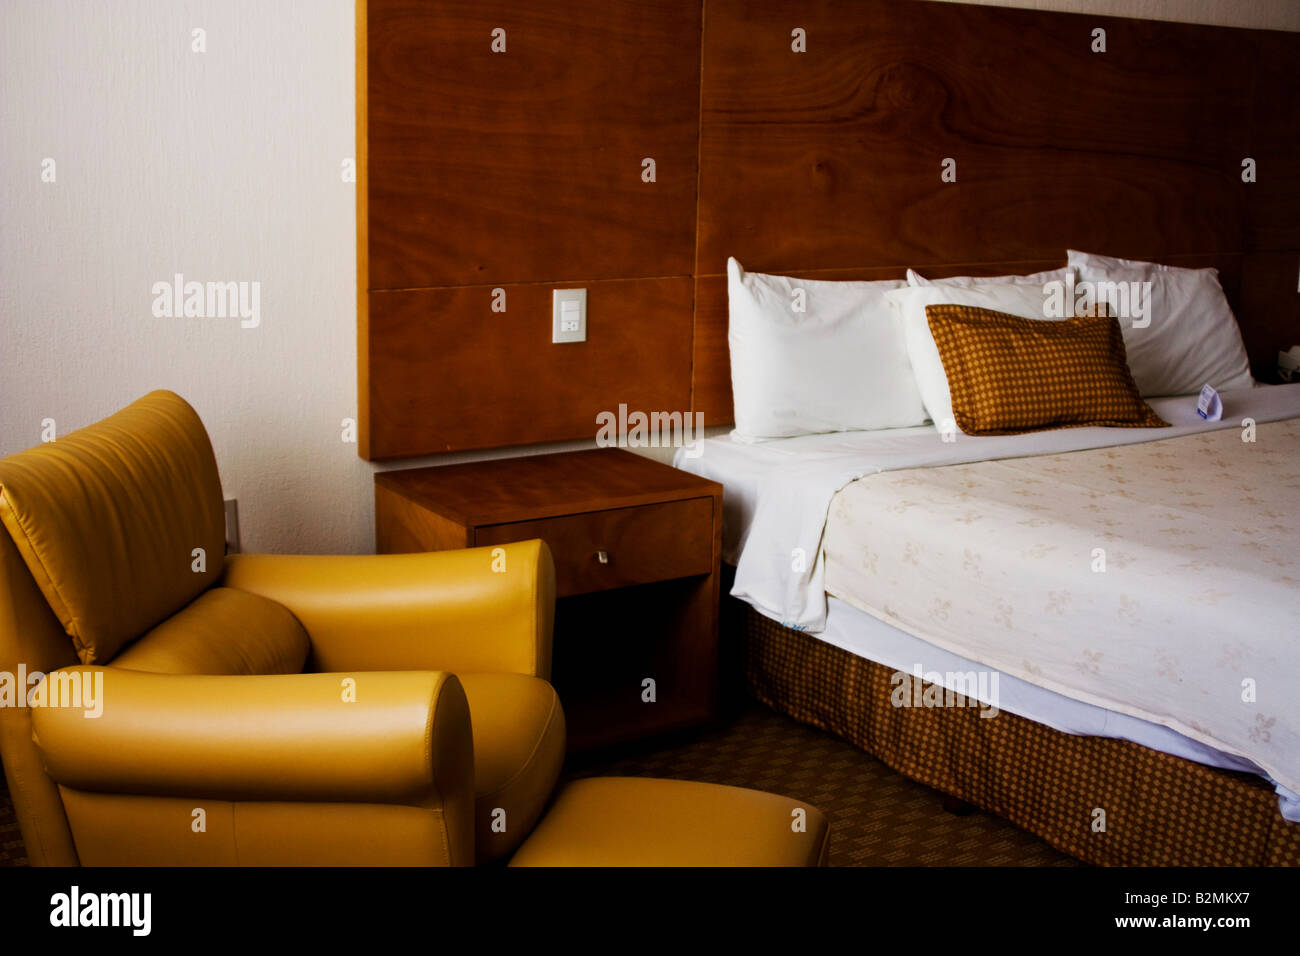 Mexico, San Luis Potosi, Room at the Holiday Inn Express Hotel - Stock Image